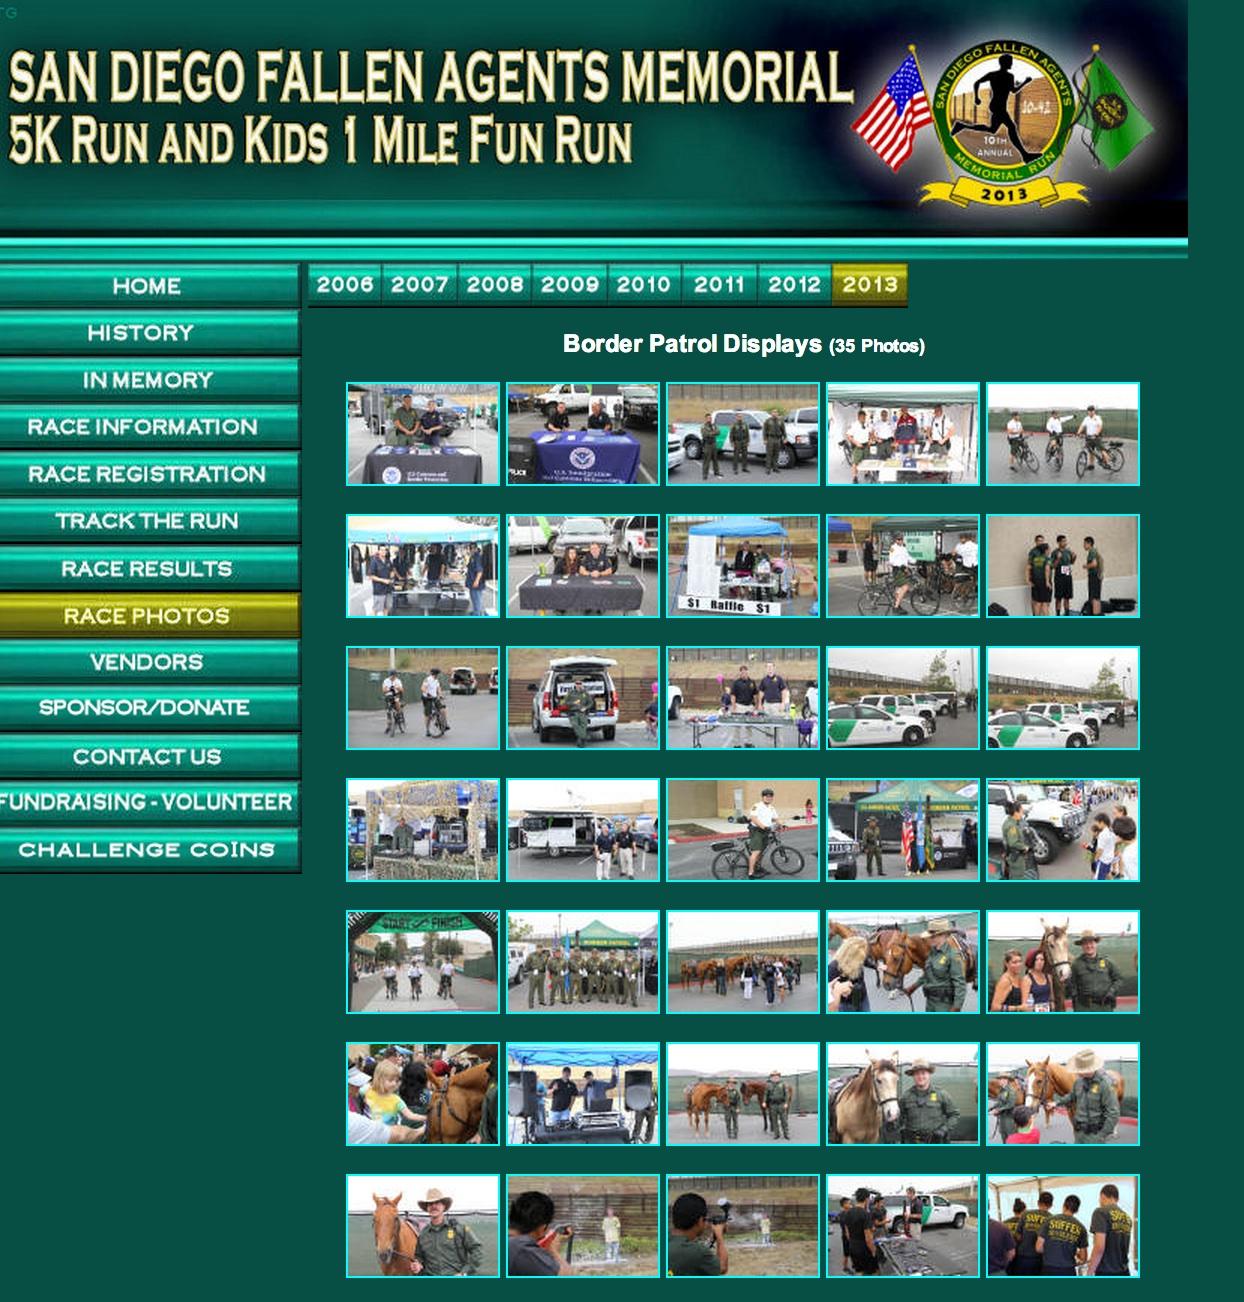 http://www.latinorebels.com/wp-content/uploads/2014/02/BorderPatrolRun.jpg